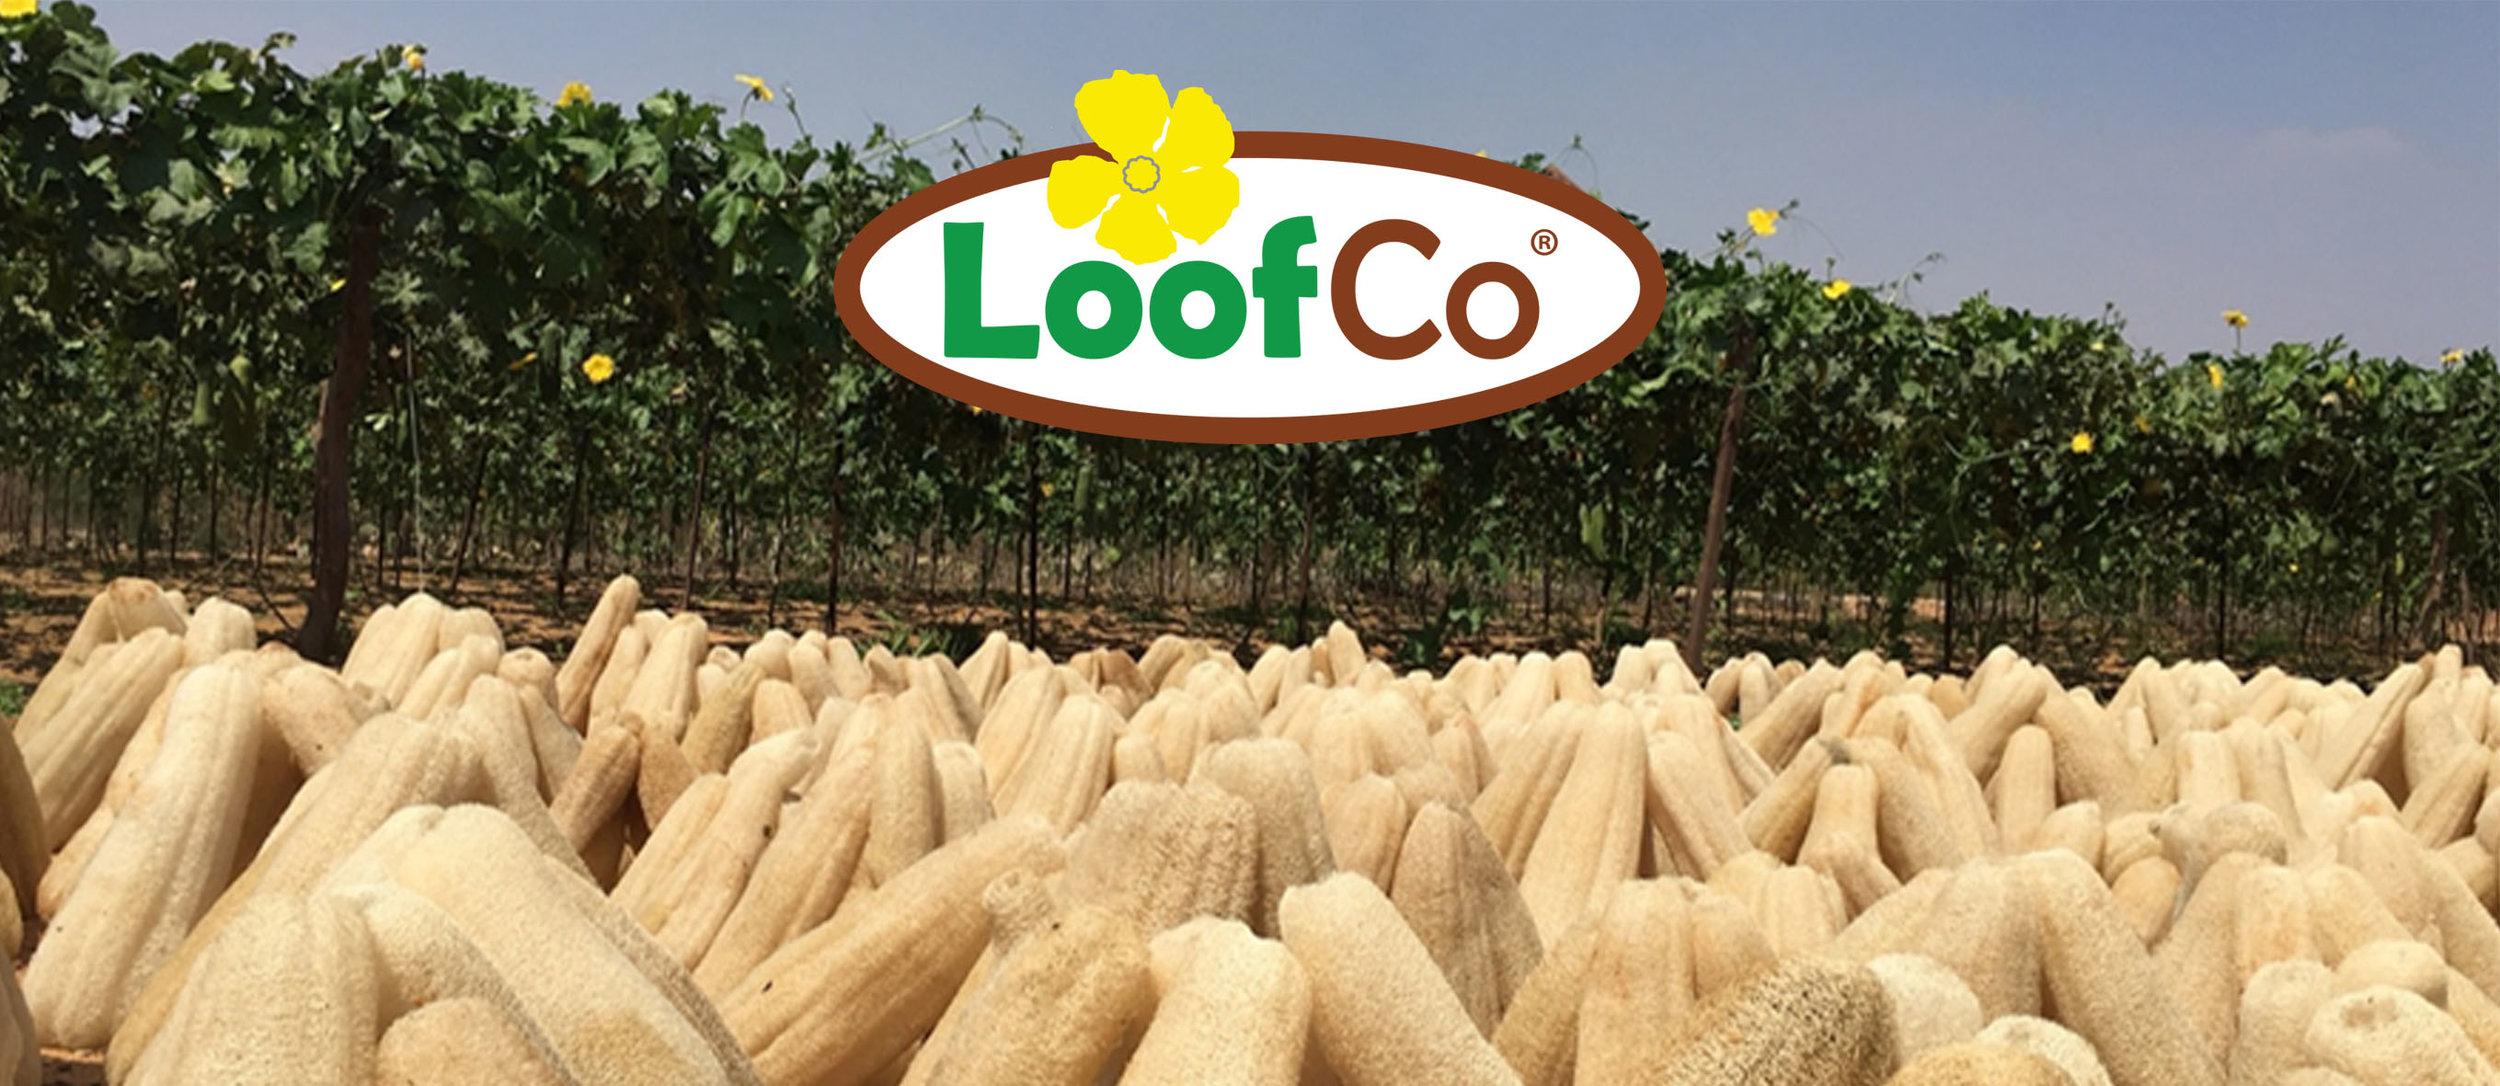 Loofco.jpg